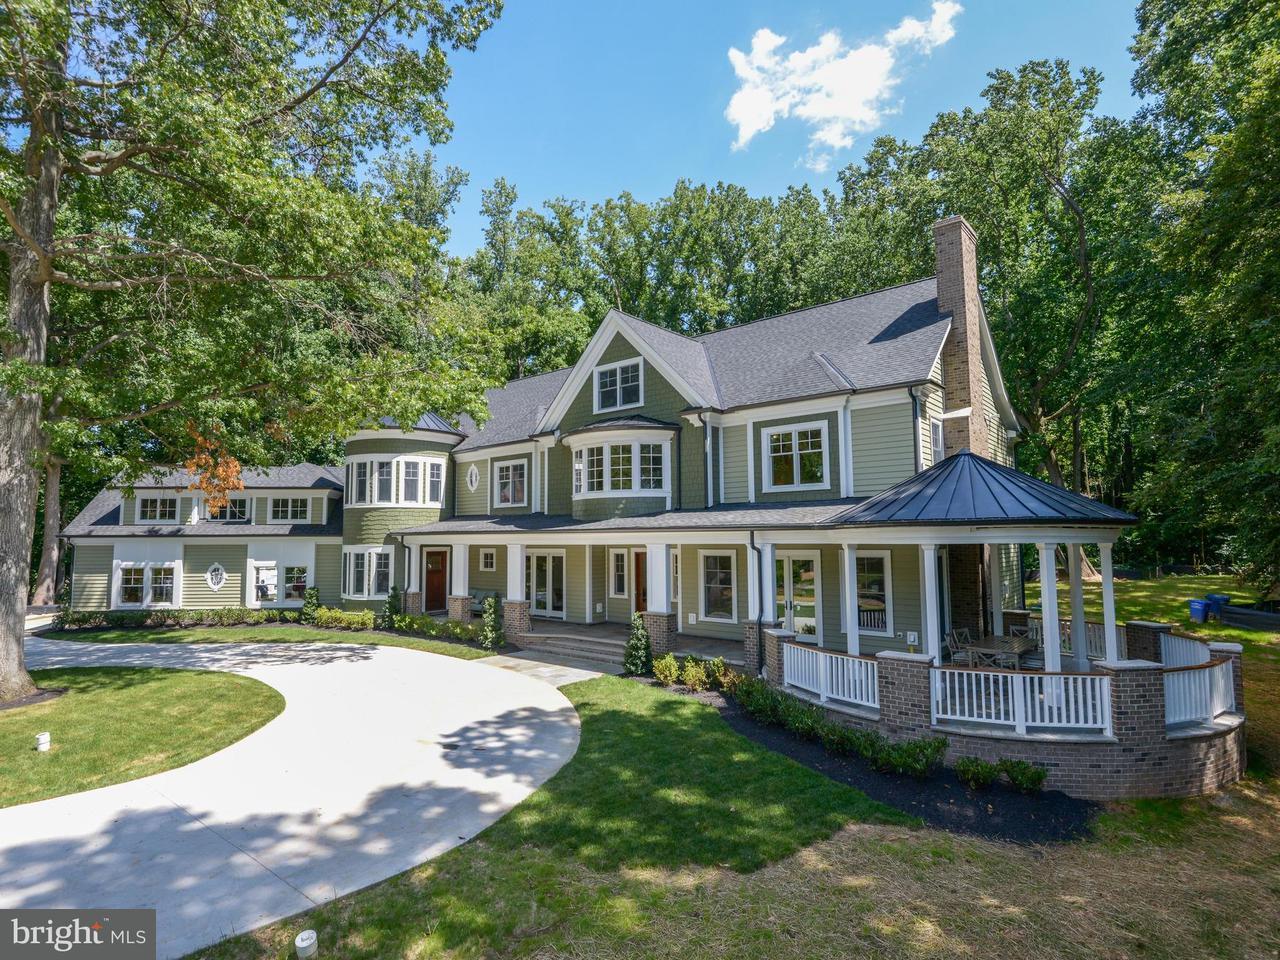 Single Family Home for Sale at 8601 Nutmeg Court 8601 Nutmeg Court Potomac, Maryland 20854 United States